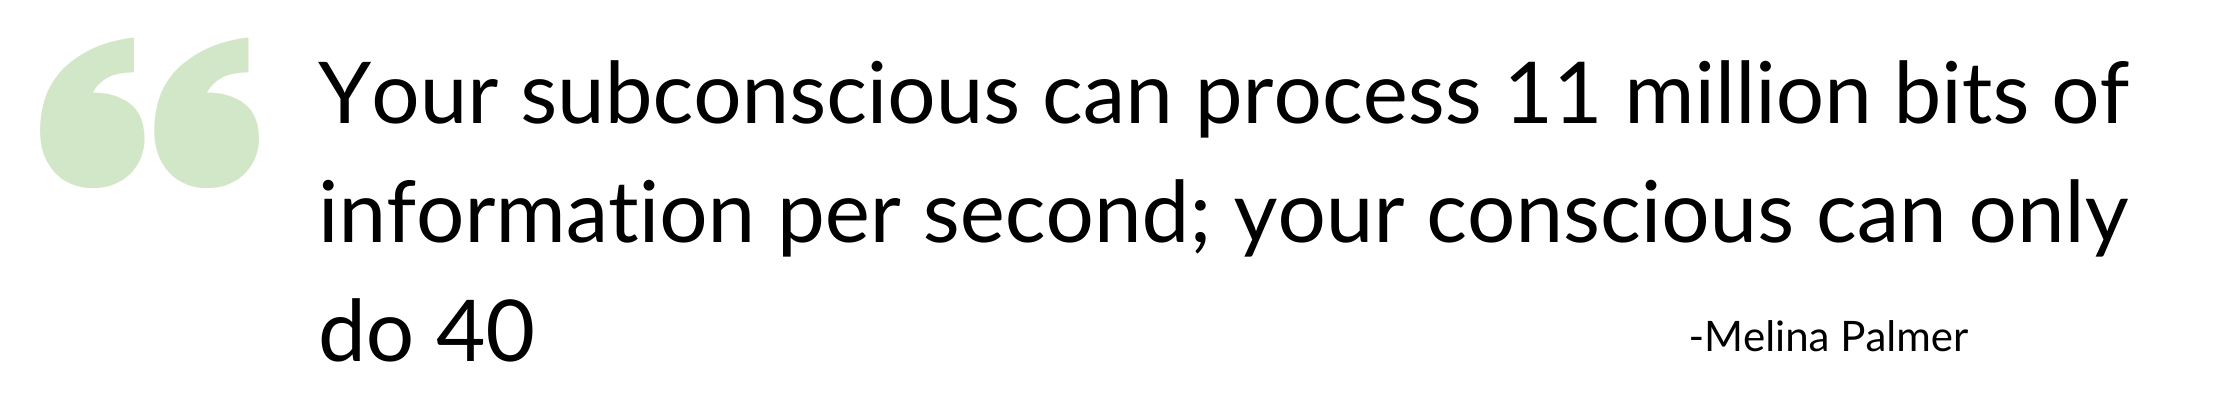 Subconscious brain processes more than your concious